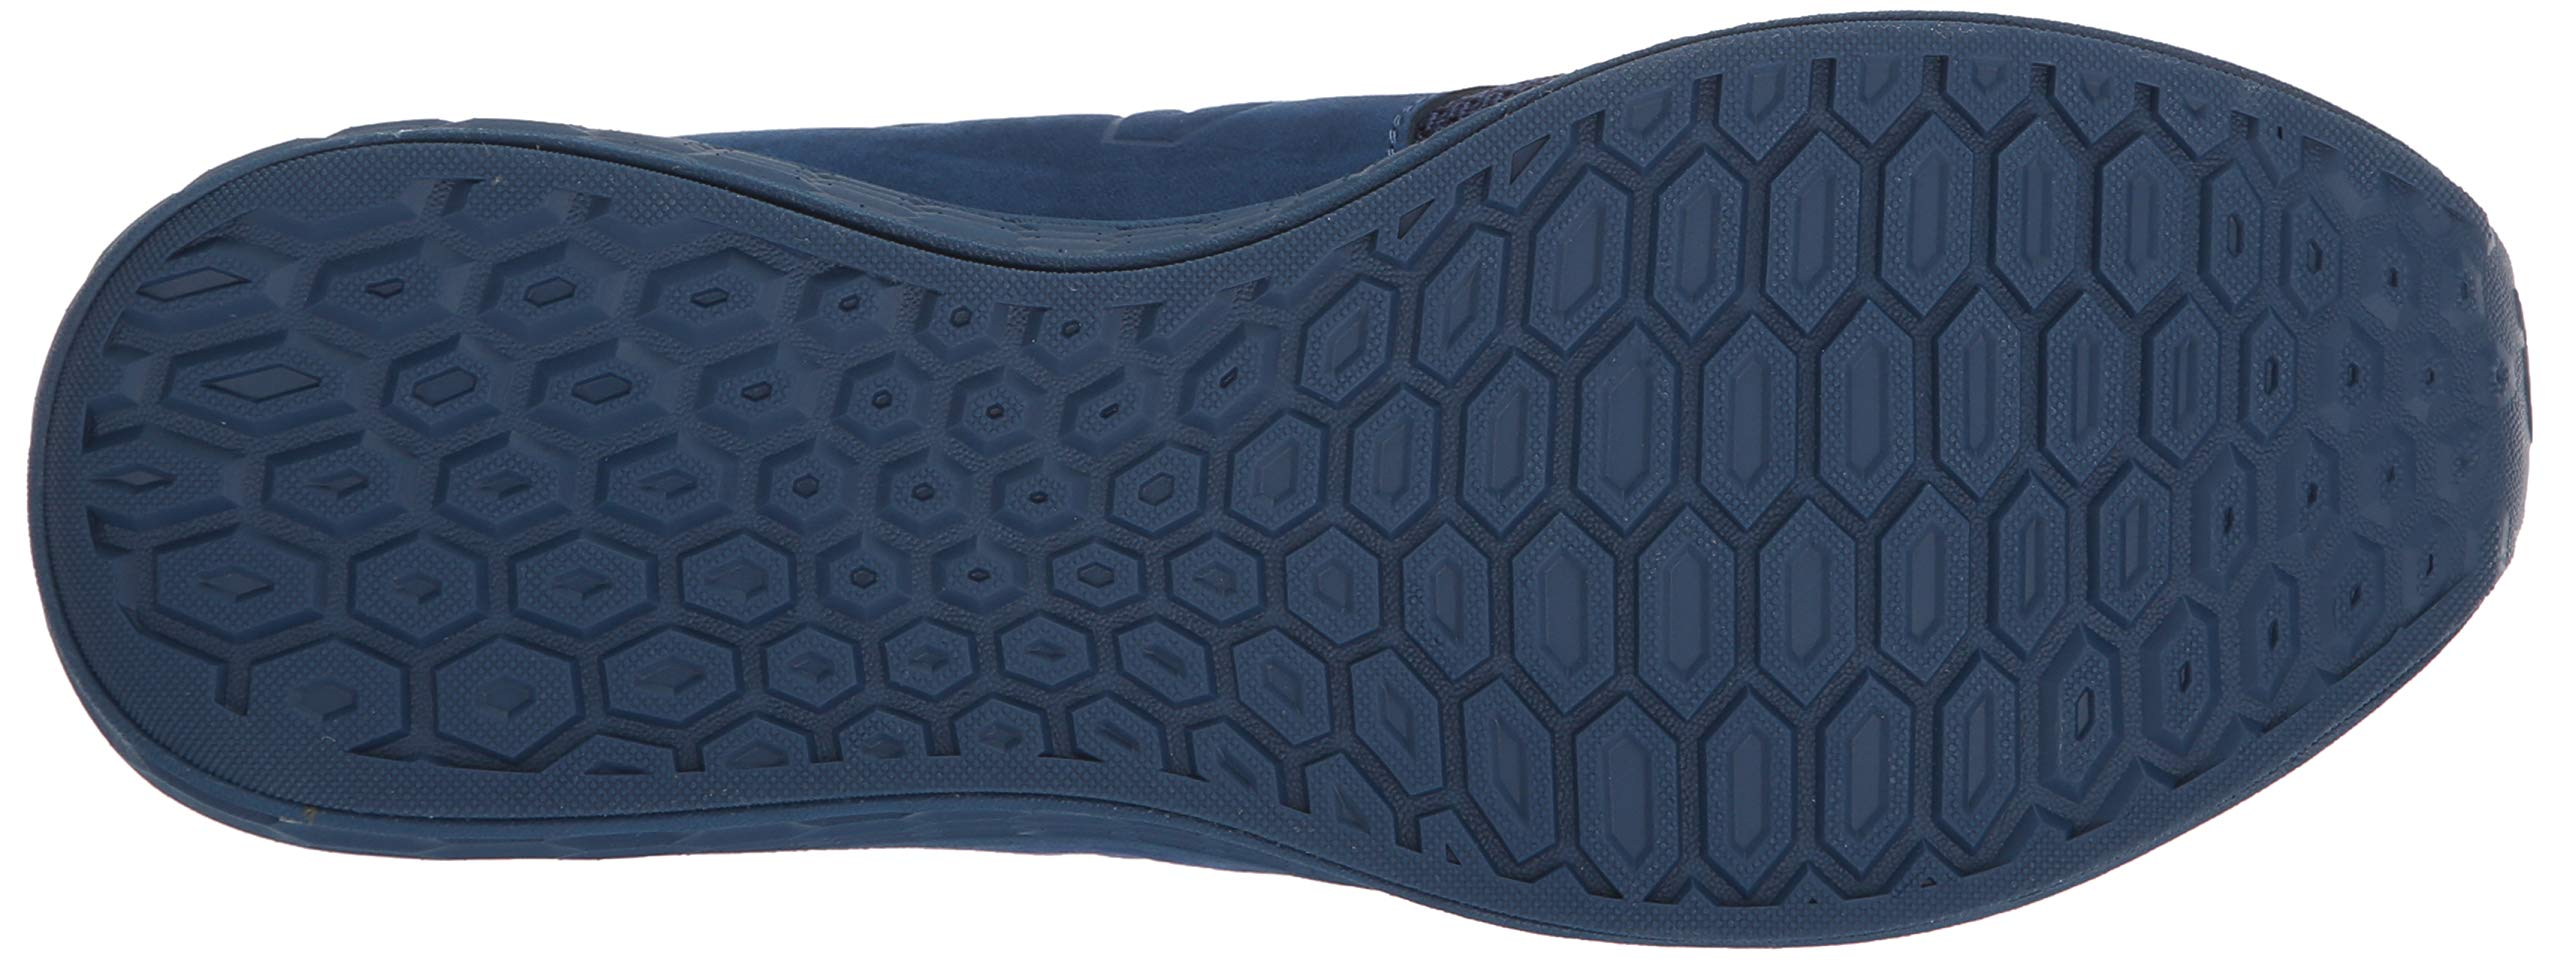 New Balance Men's Cruz V2 Fresh Foam Running Shoe, moroccan tile, 7 D US by New Balance (Image #3)